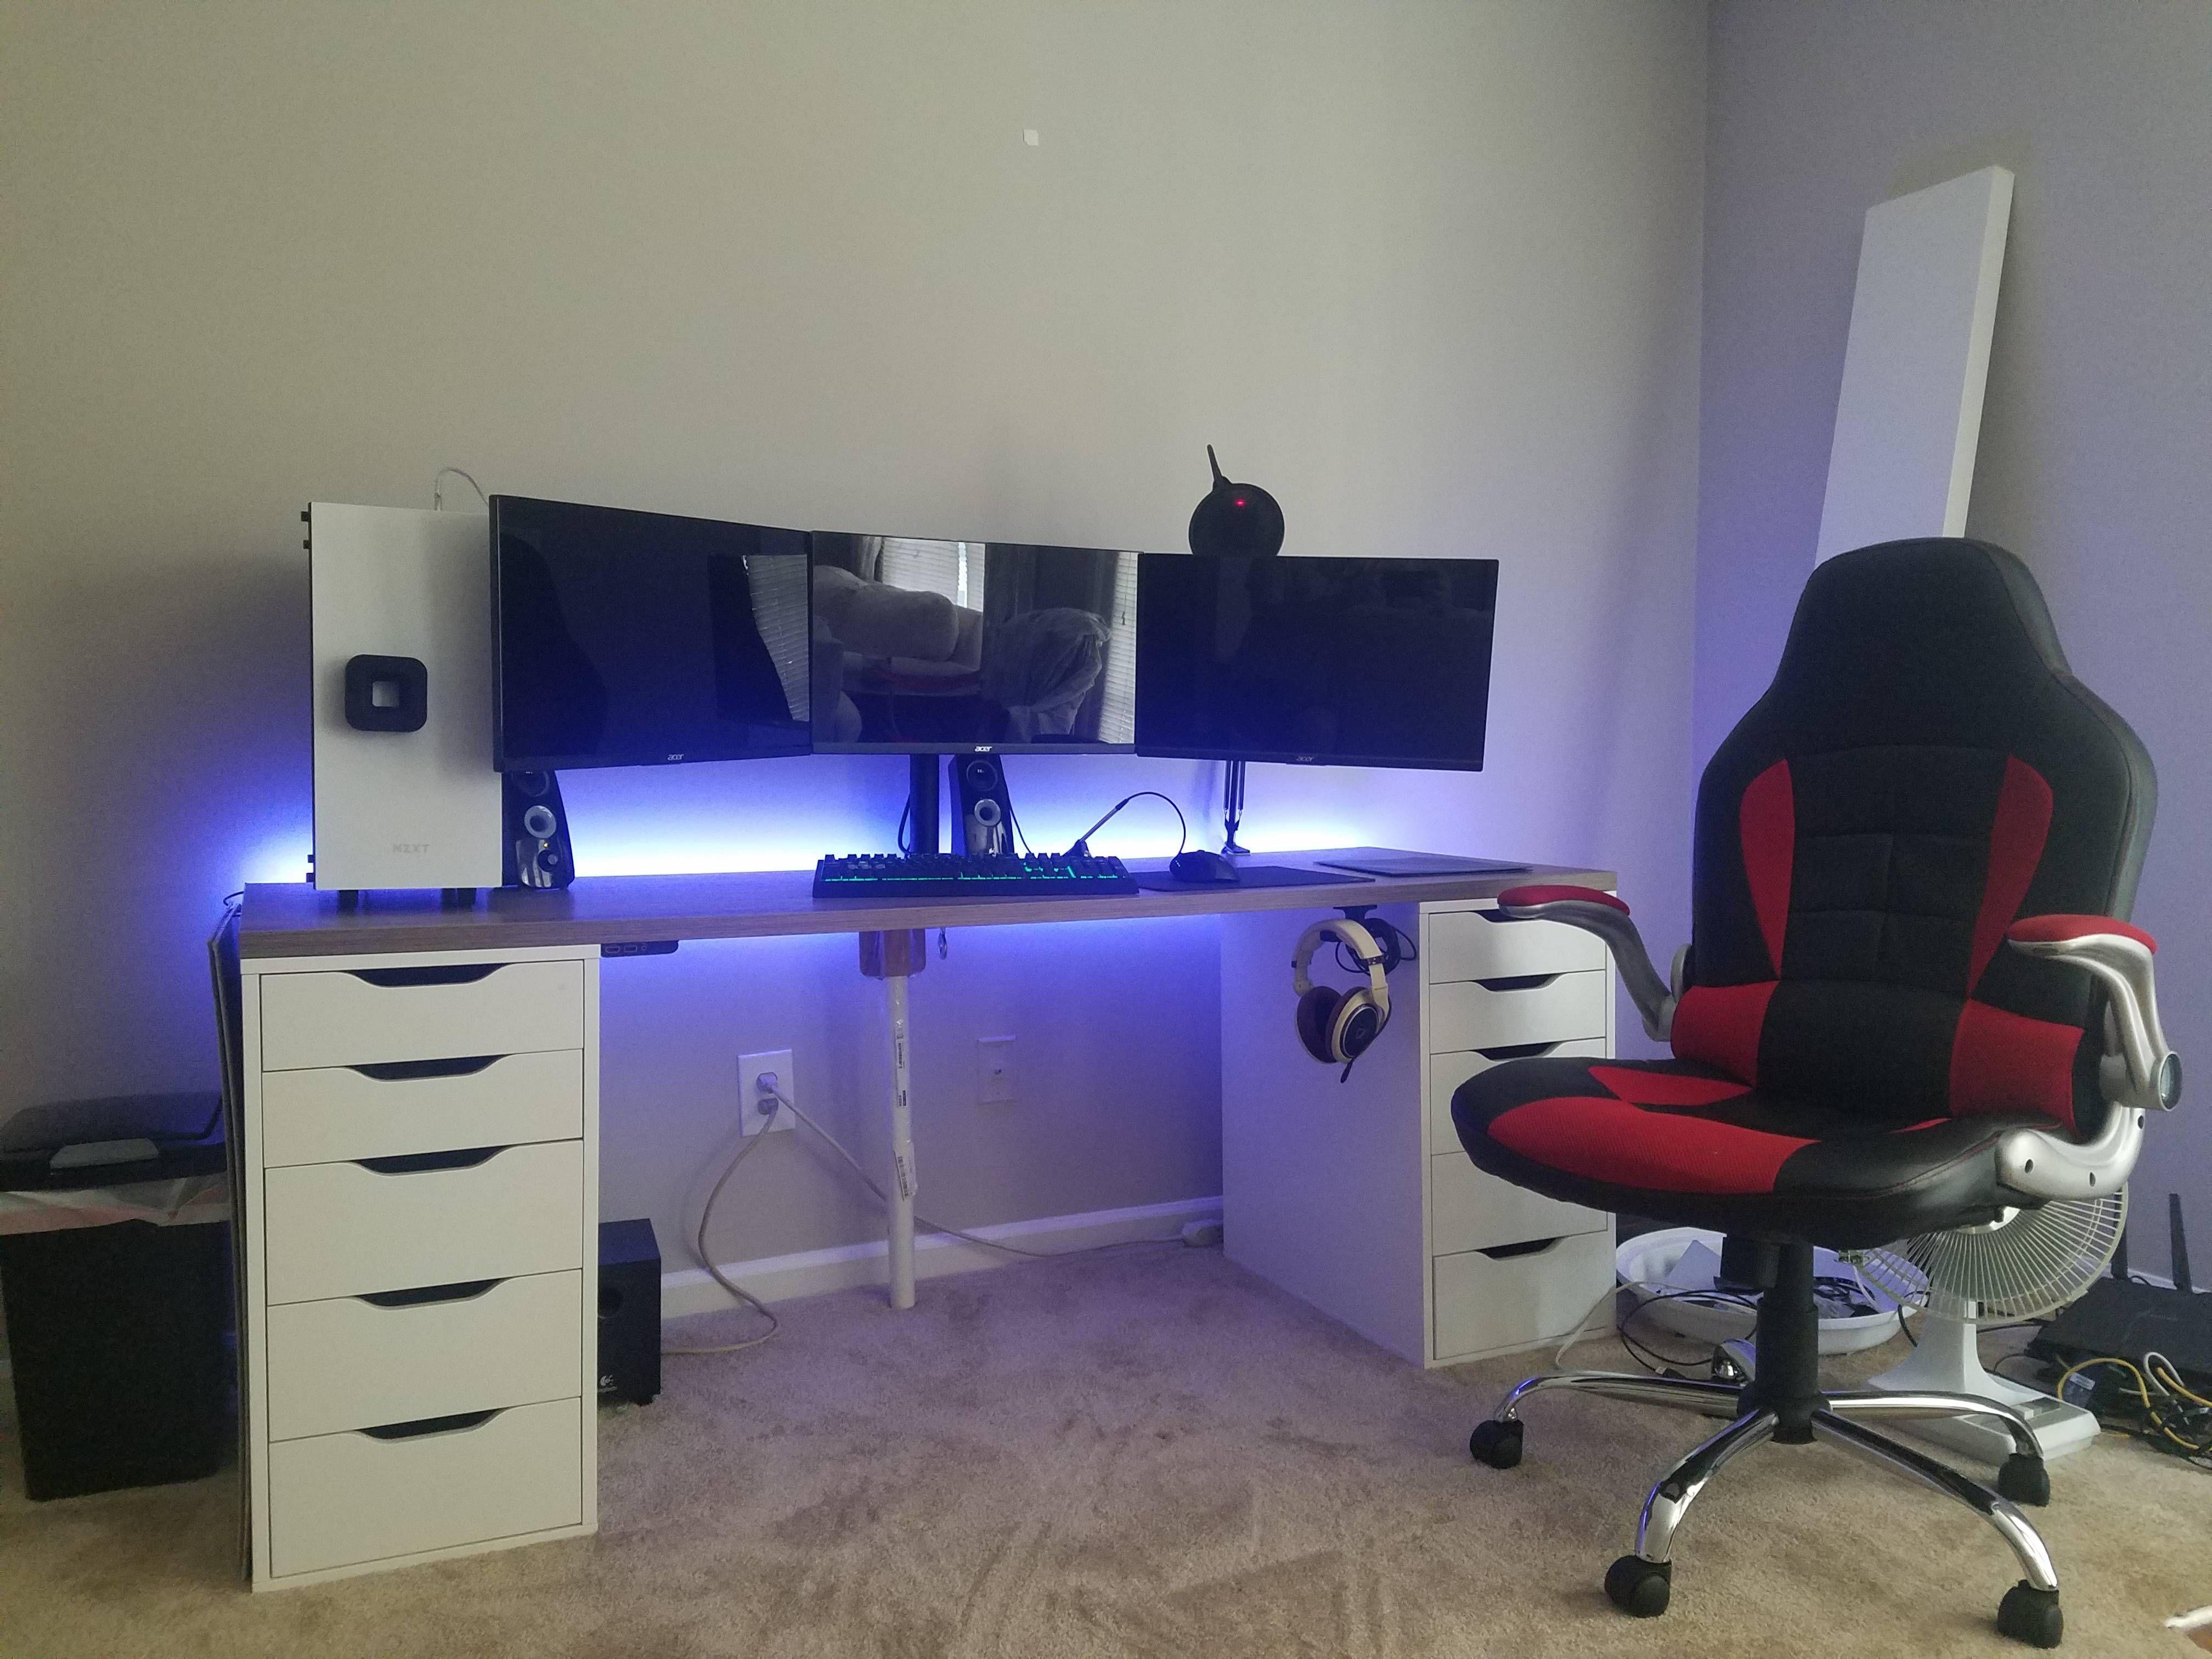 New apartment Same generic Ikea desk!   bestgamesetups.com ...